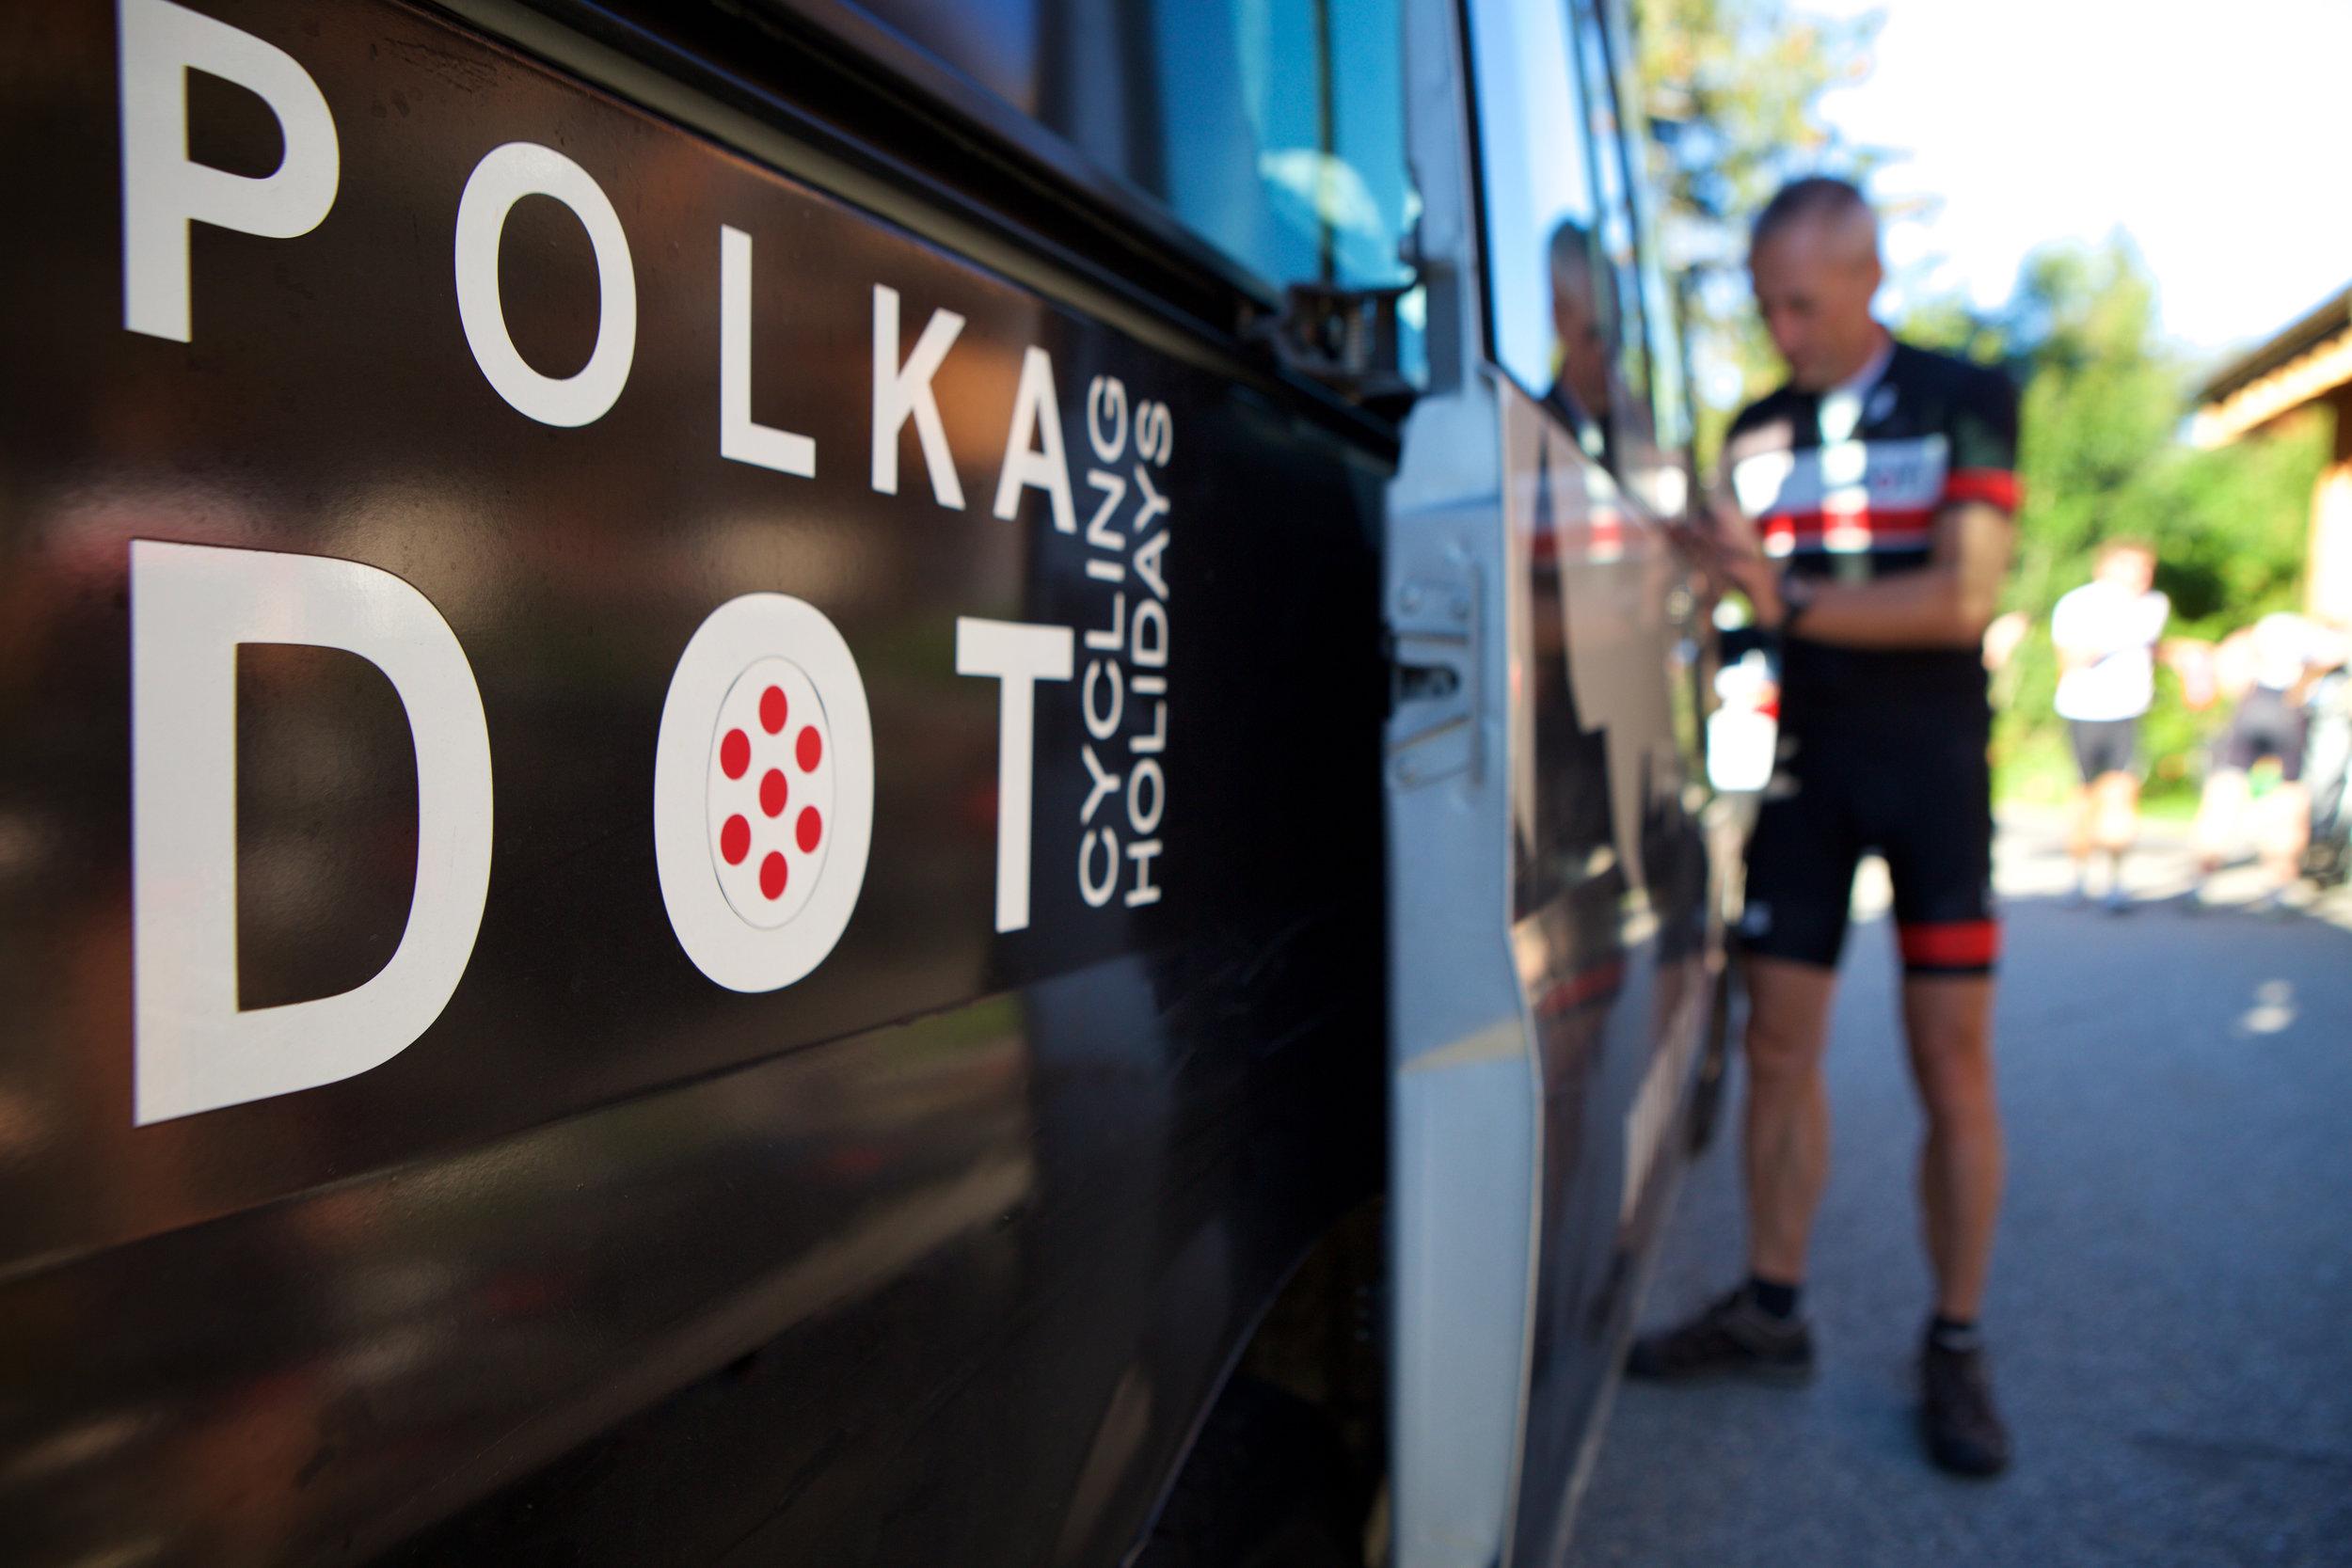 Polka Dot Cycling Support